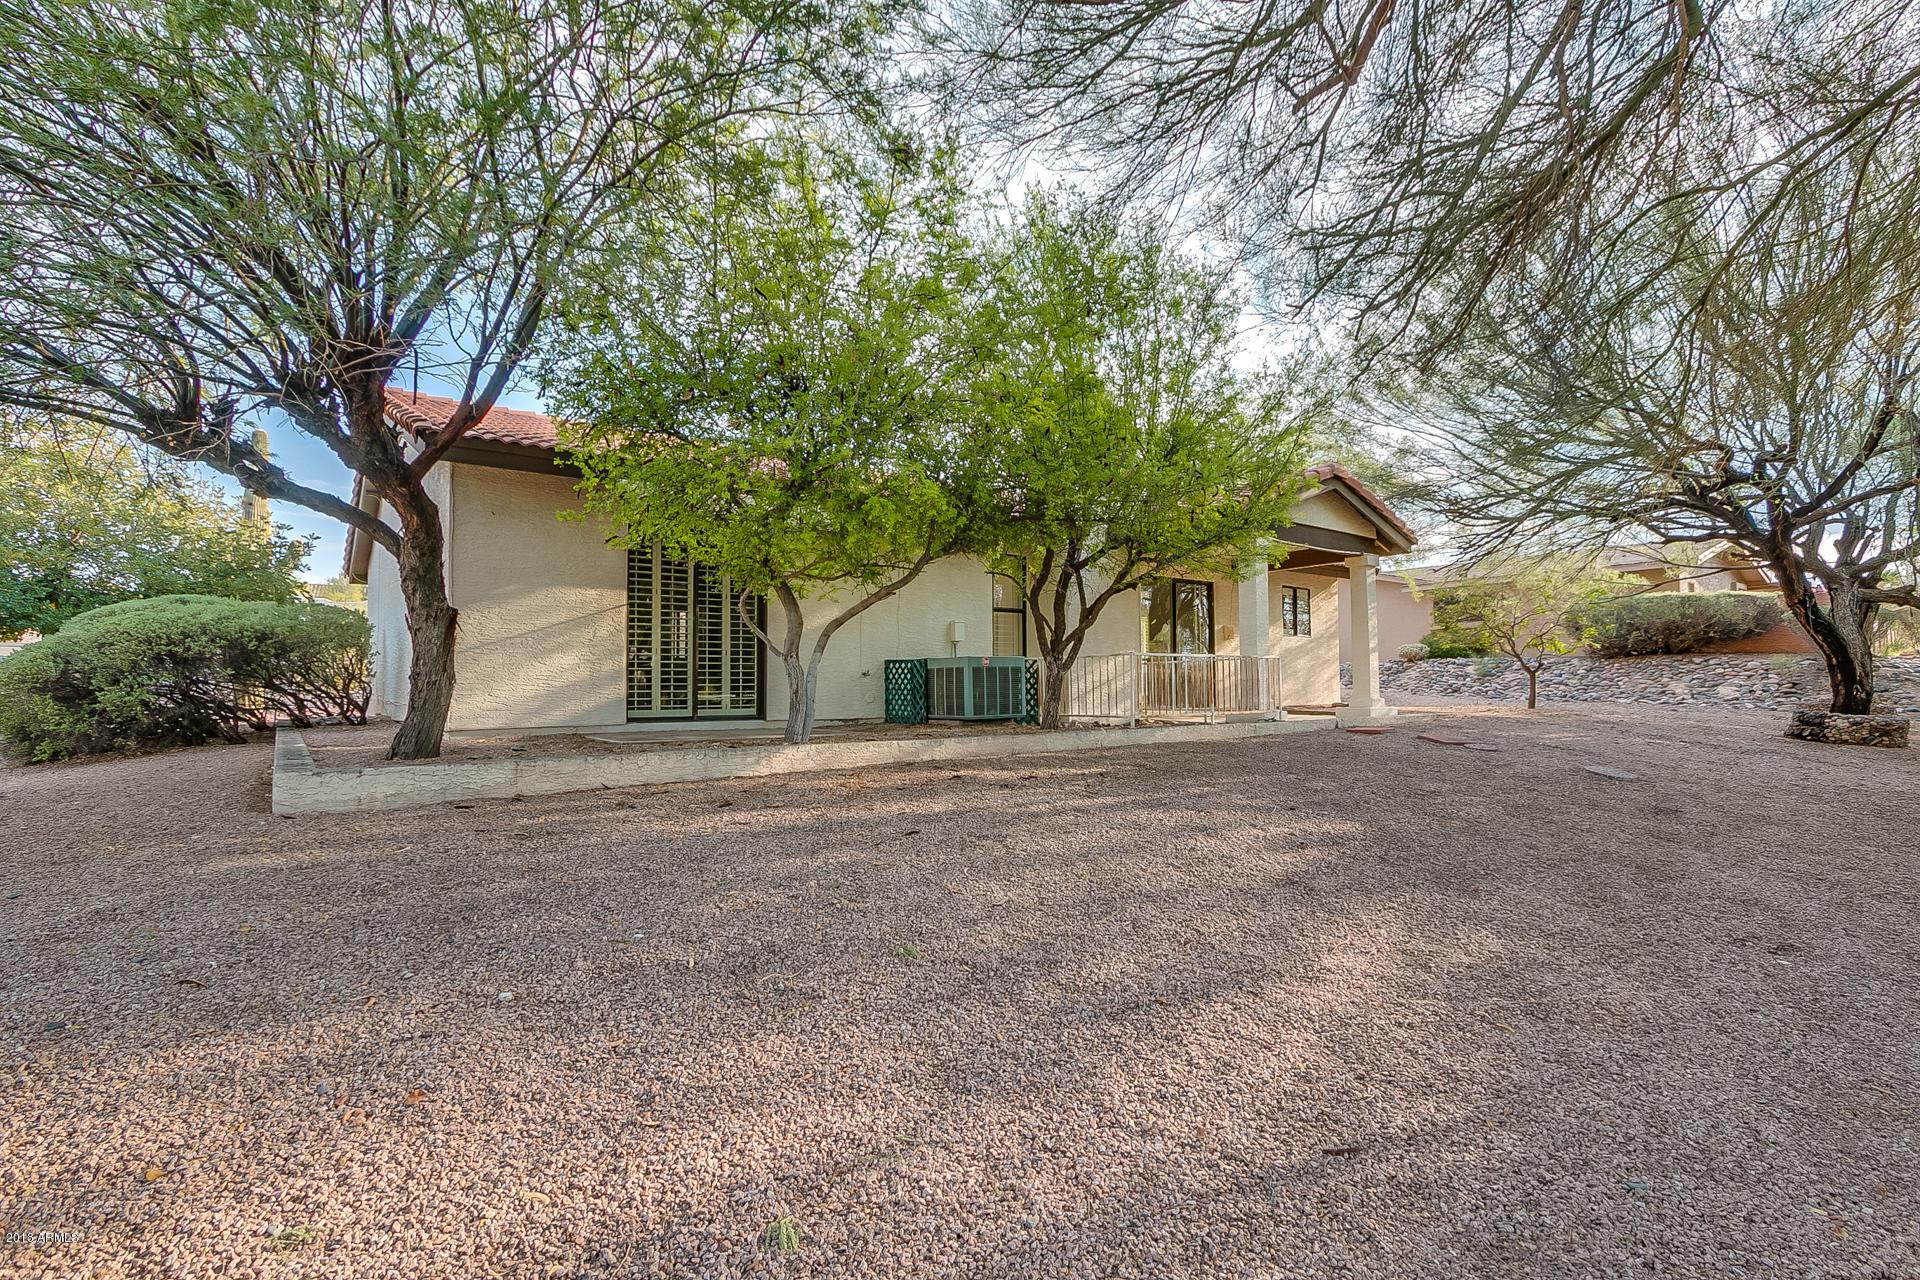 MLS 5802928 17205 E LANTERN Lane, Fountain Hills, AZ 85268 Fountain Hills AZ Affordable